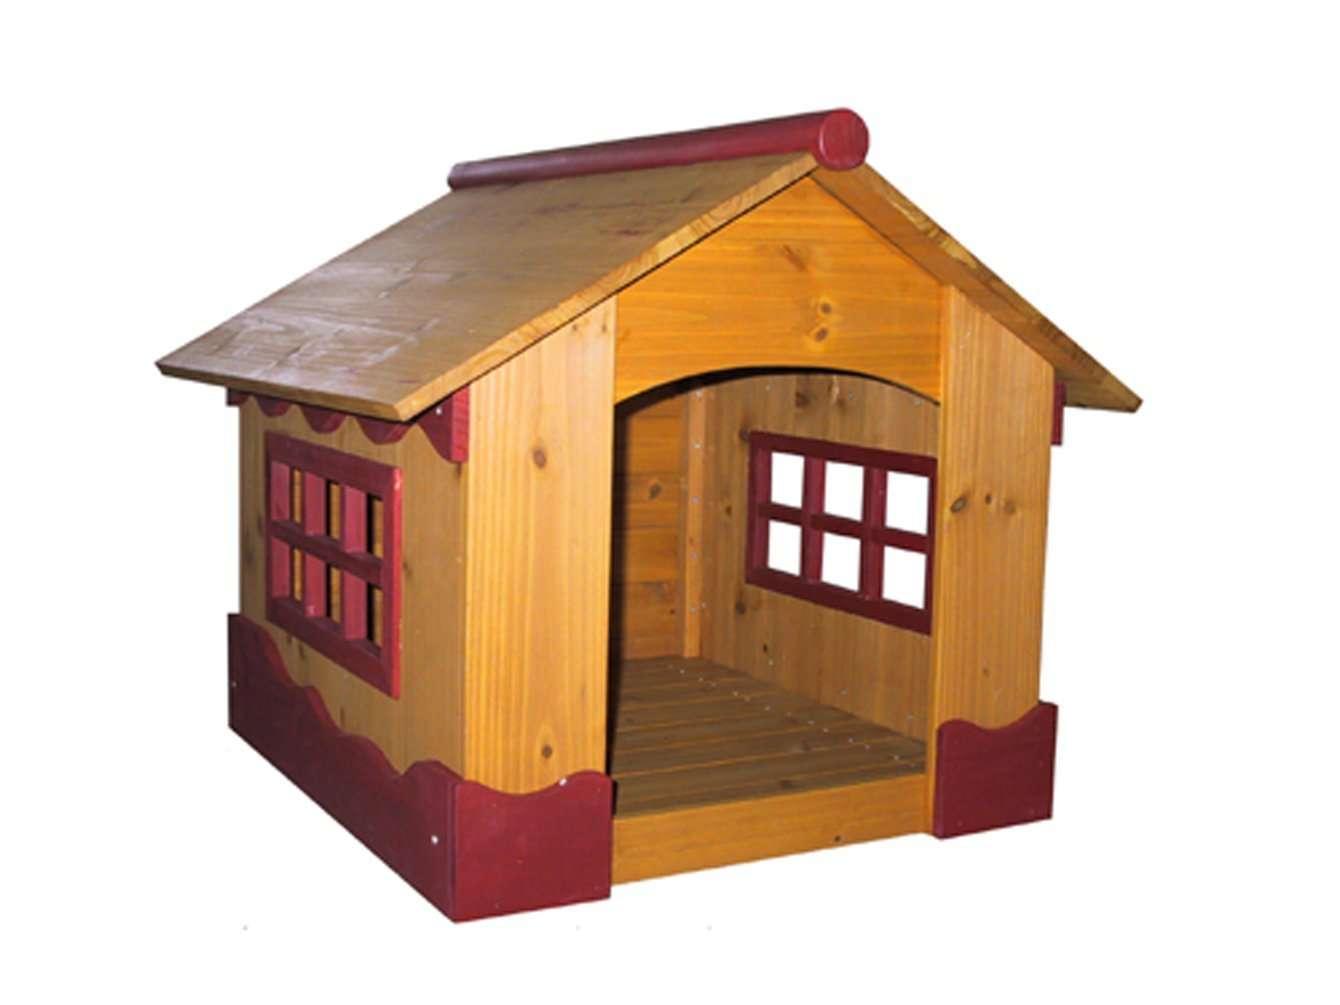 Casa para mascotas perros madera peque a vv4 3 - Casa pequena de madera ...